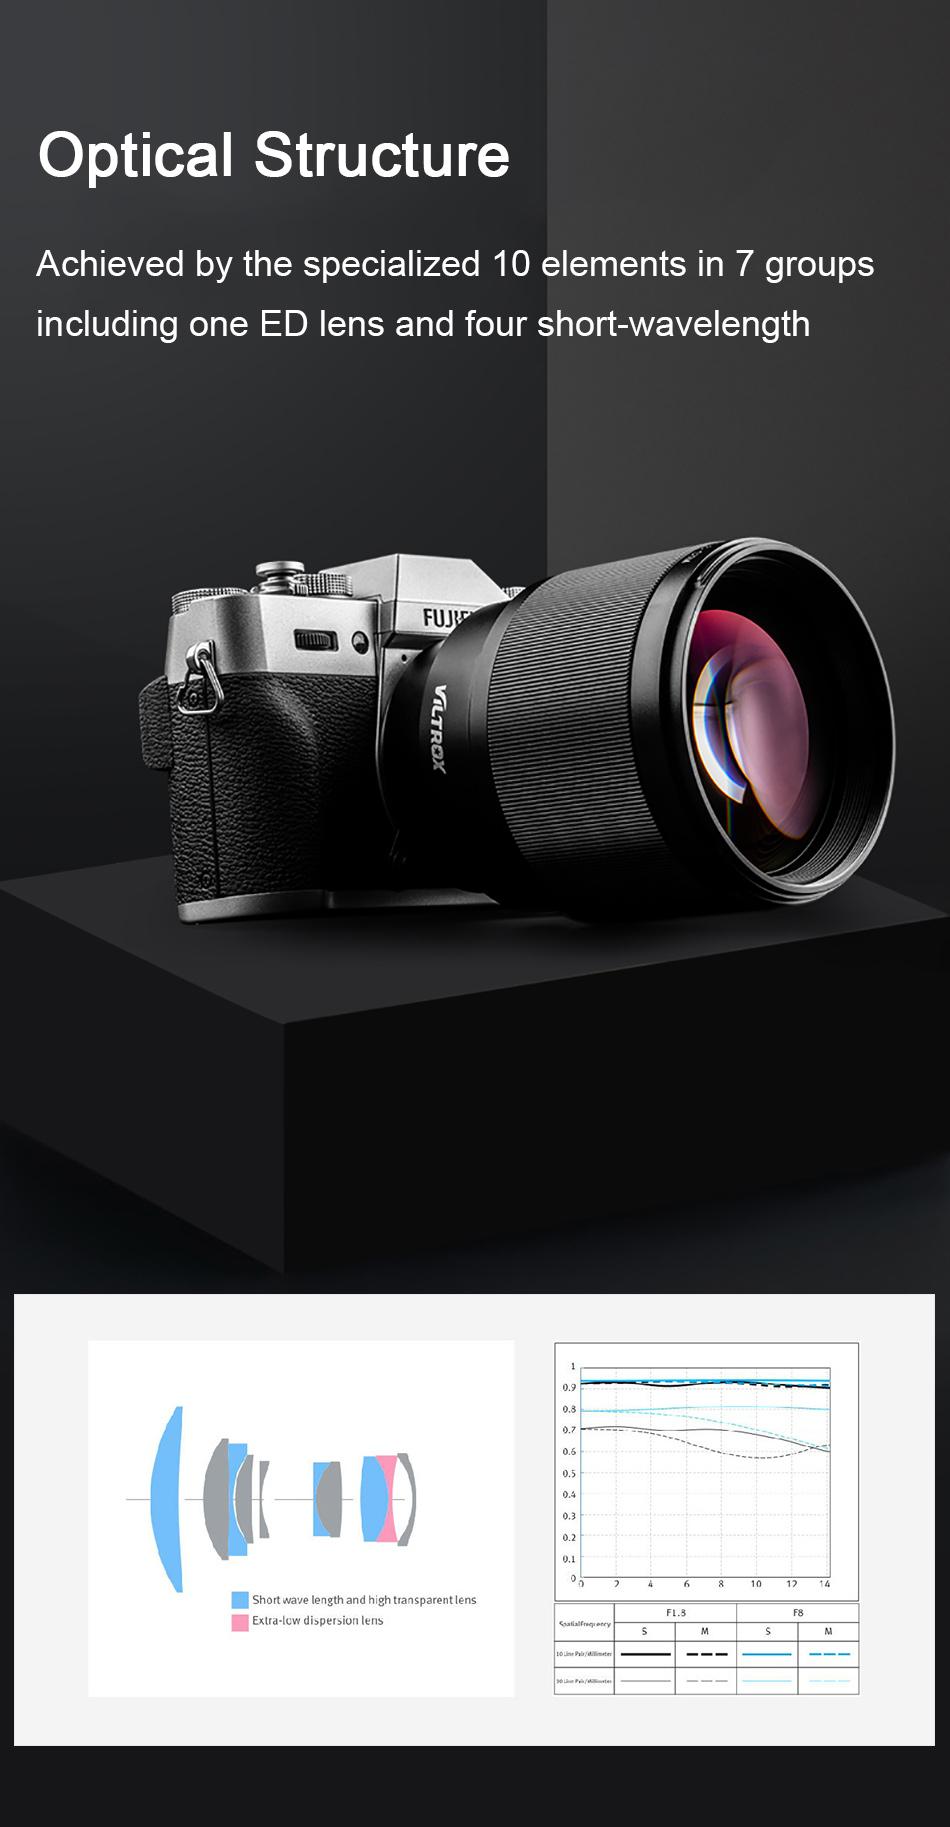 fuji lens (4)